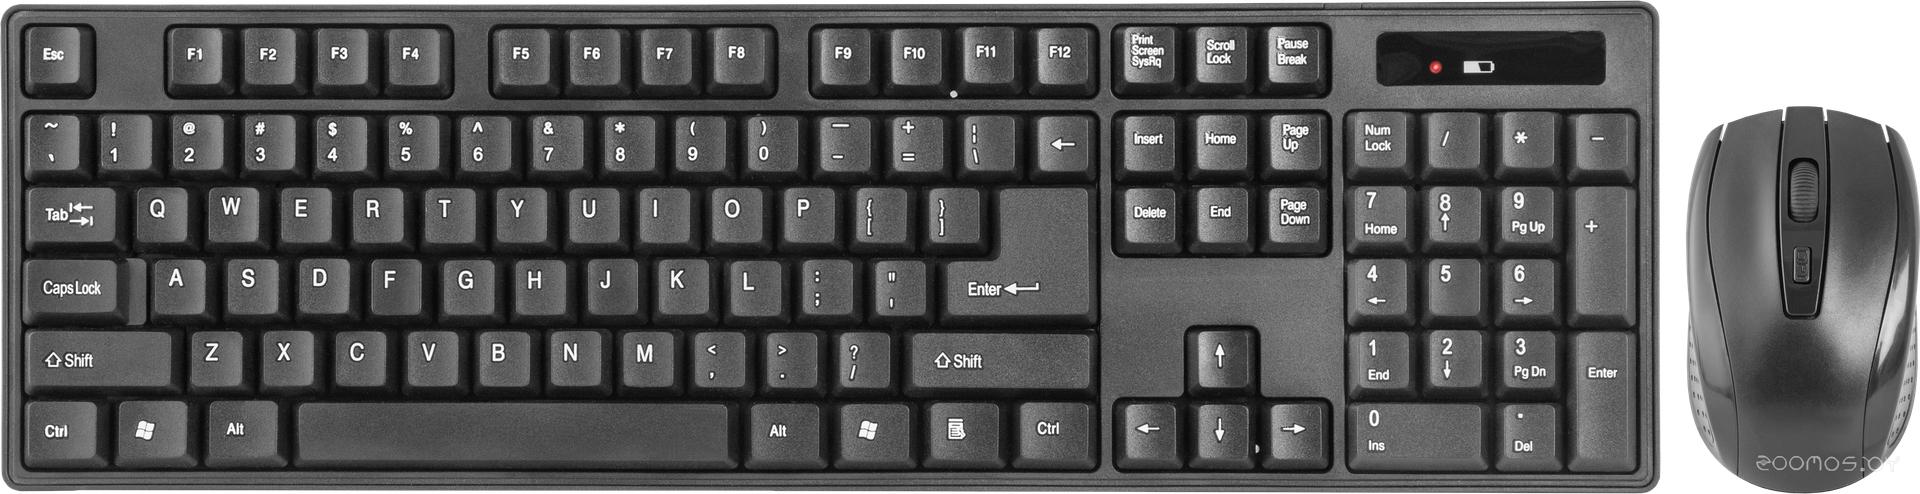 Клавиатура + мышь Defender C-915